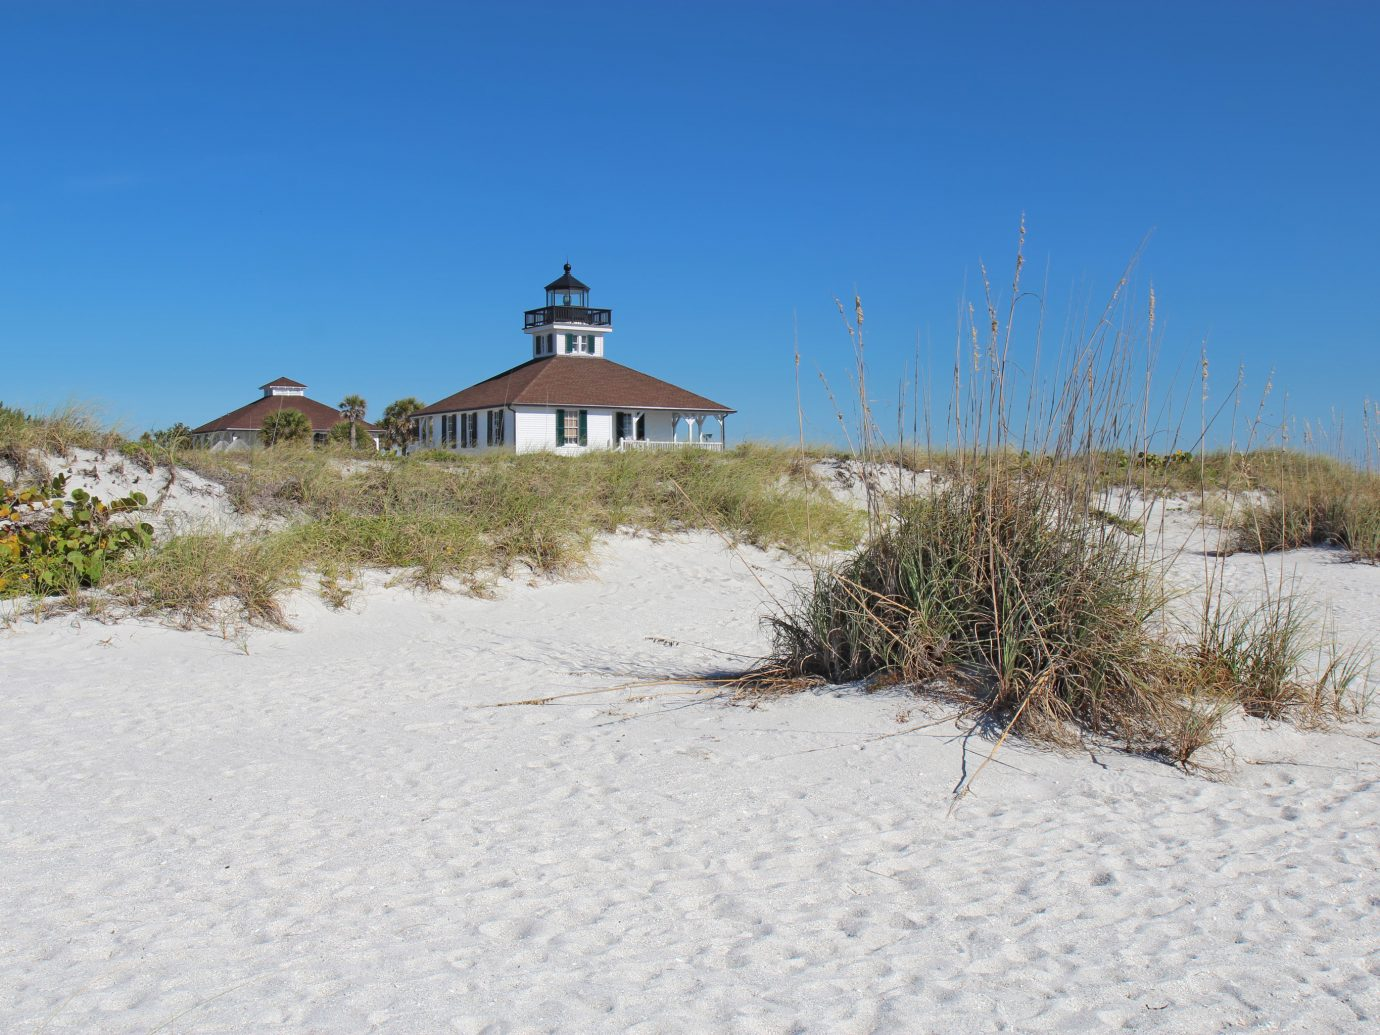 Gasparilla Island in Florida